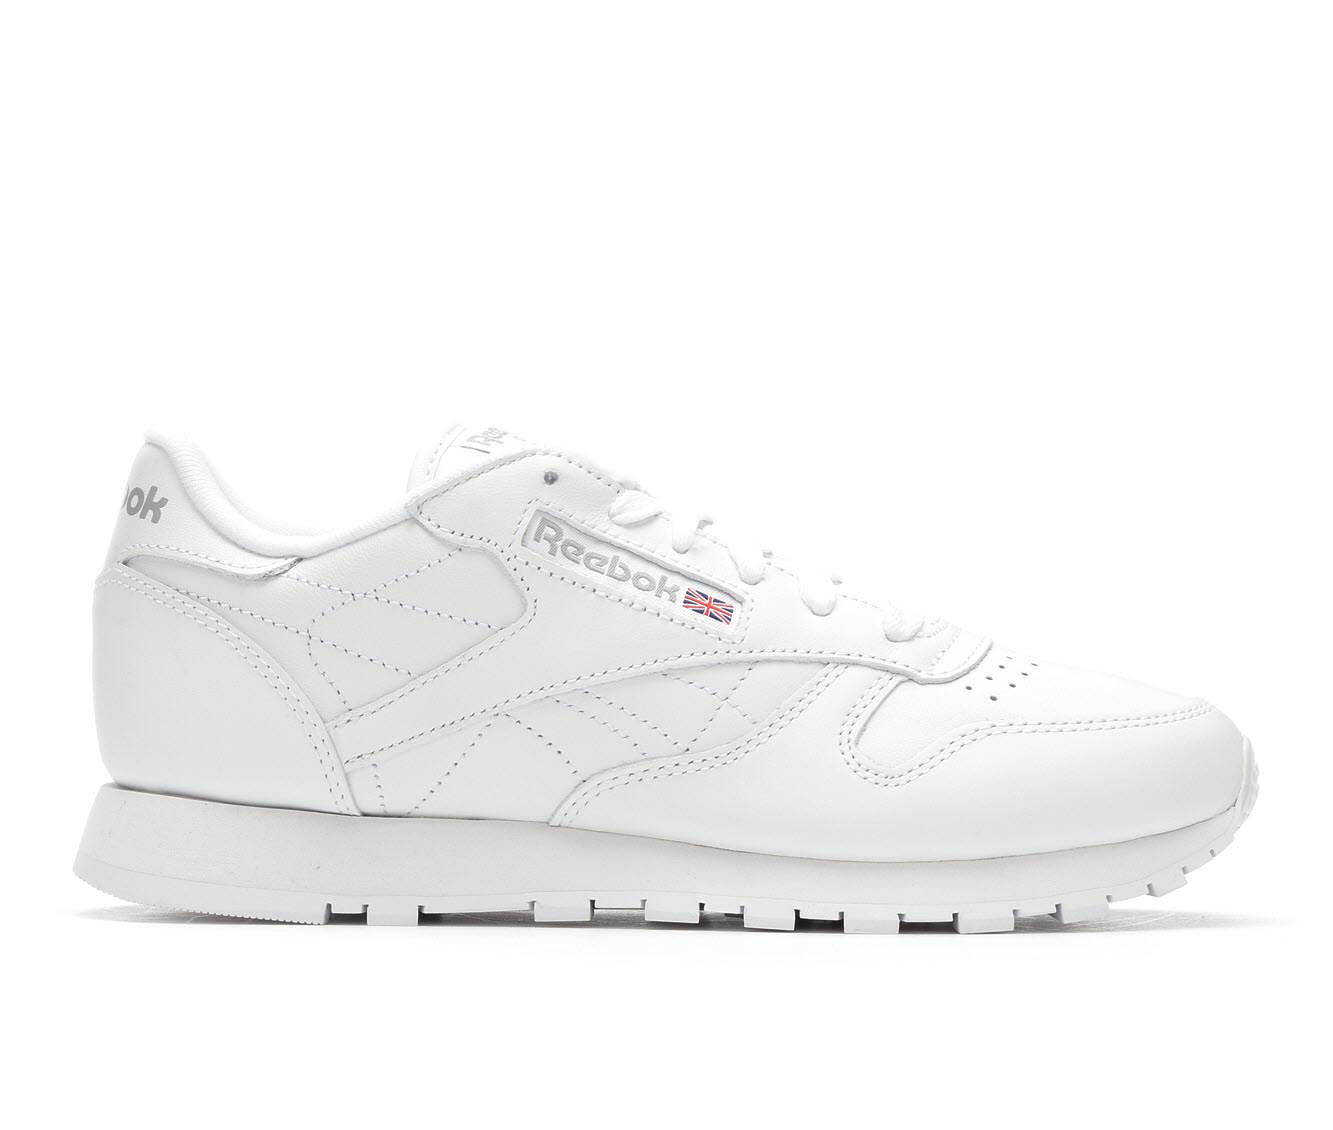 Reebok Classic Leather Jog Women's Athletic Shoe (White)